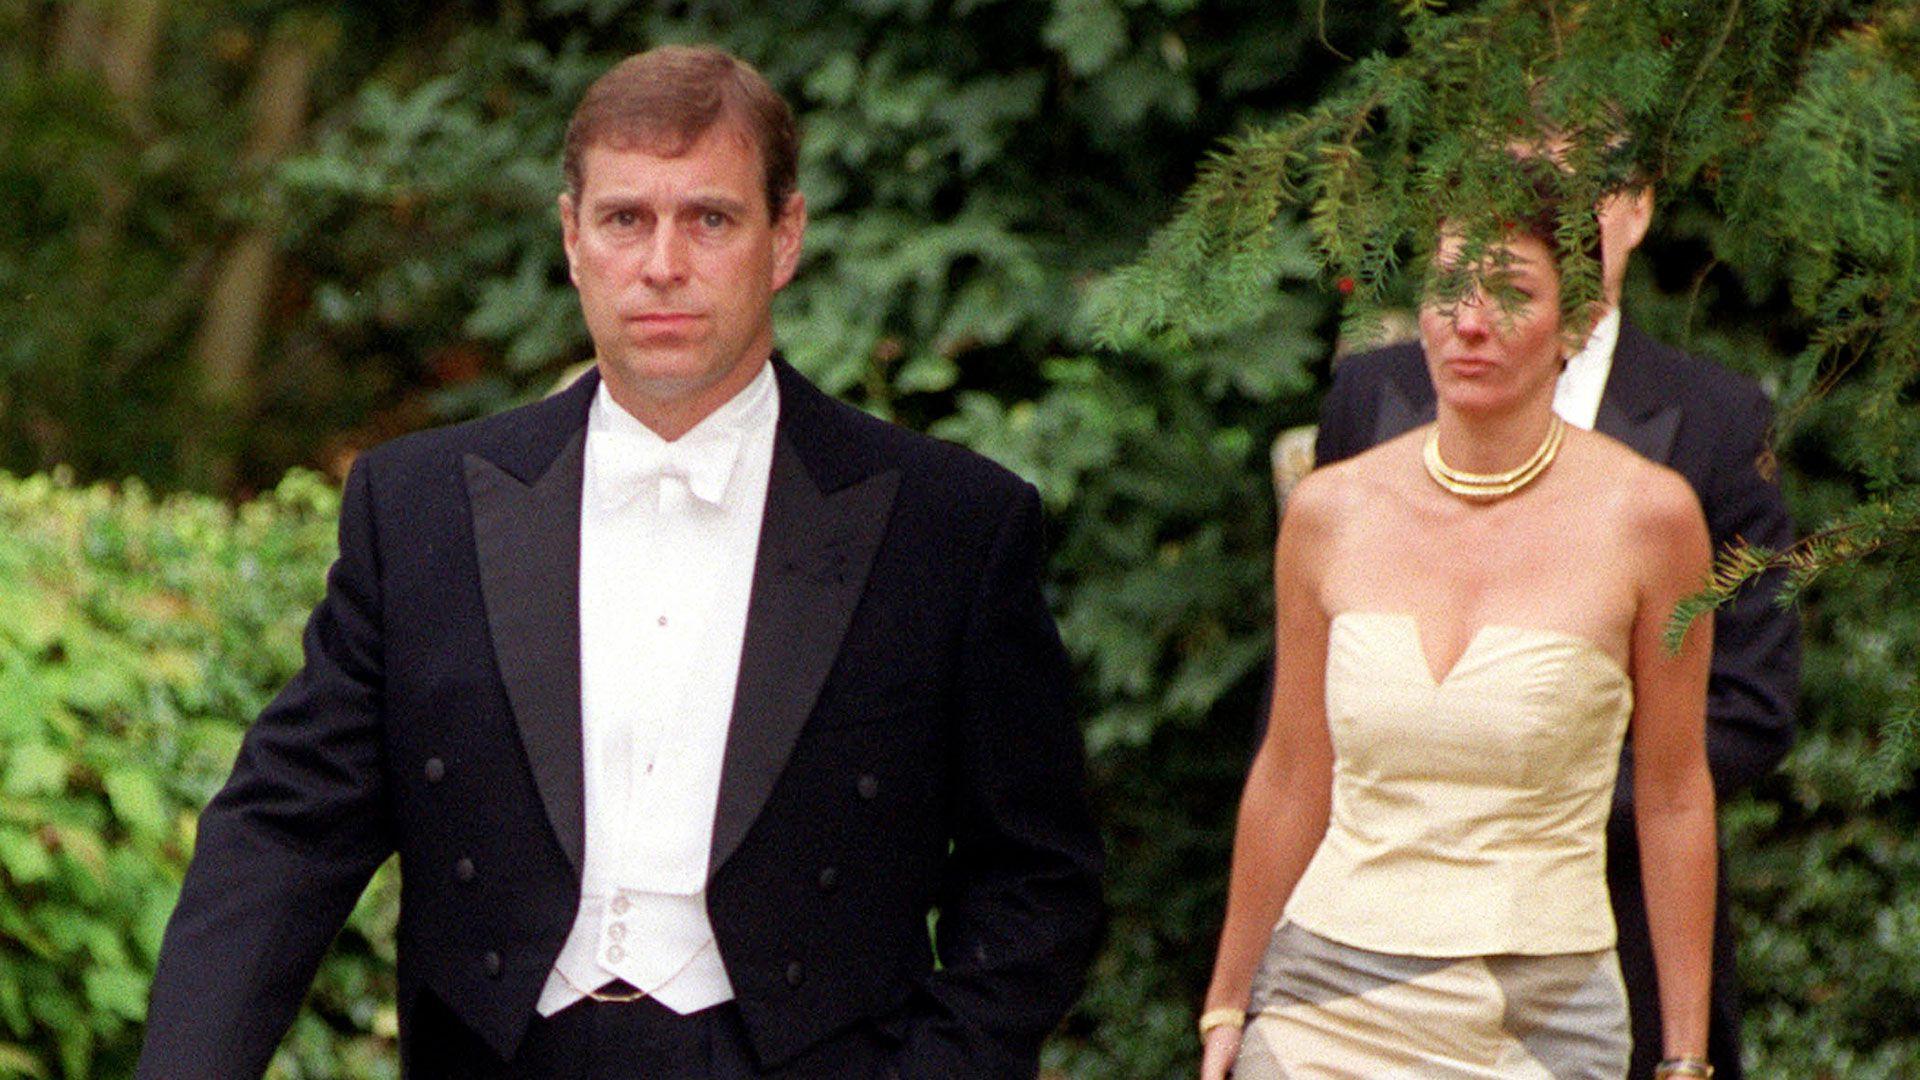 Principe Andres y Ghislaine Maxwell